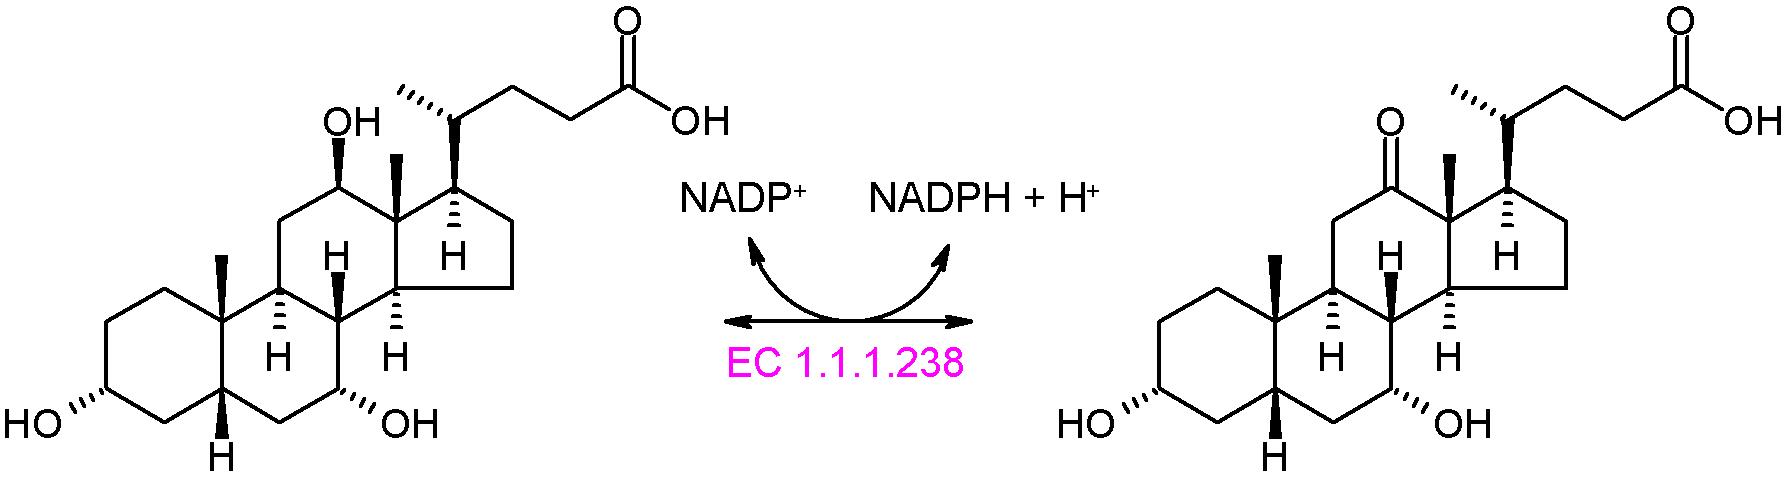 12beta-hydroxysteroid dehydrogenase